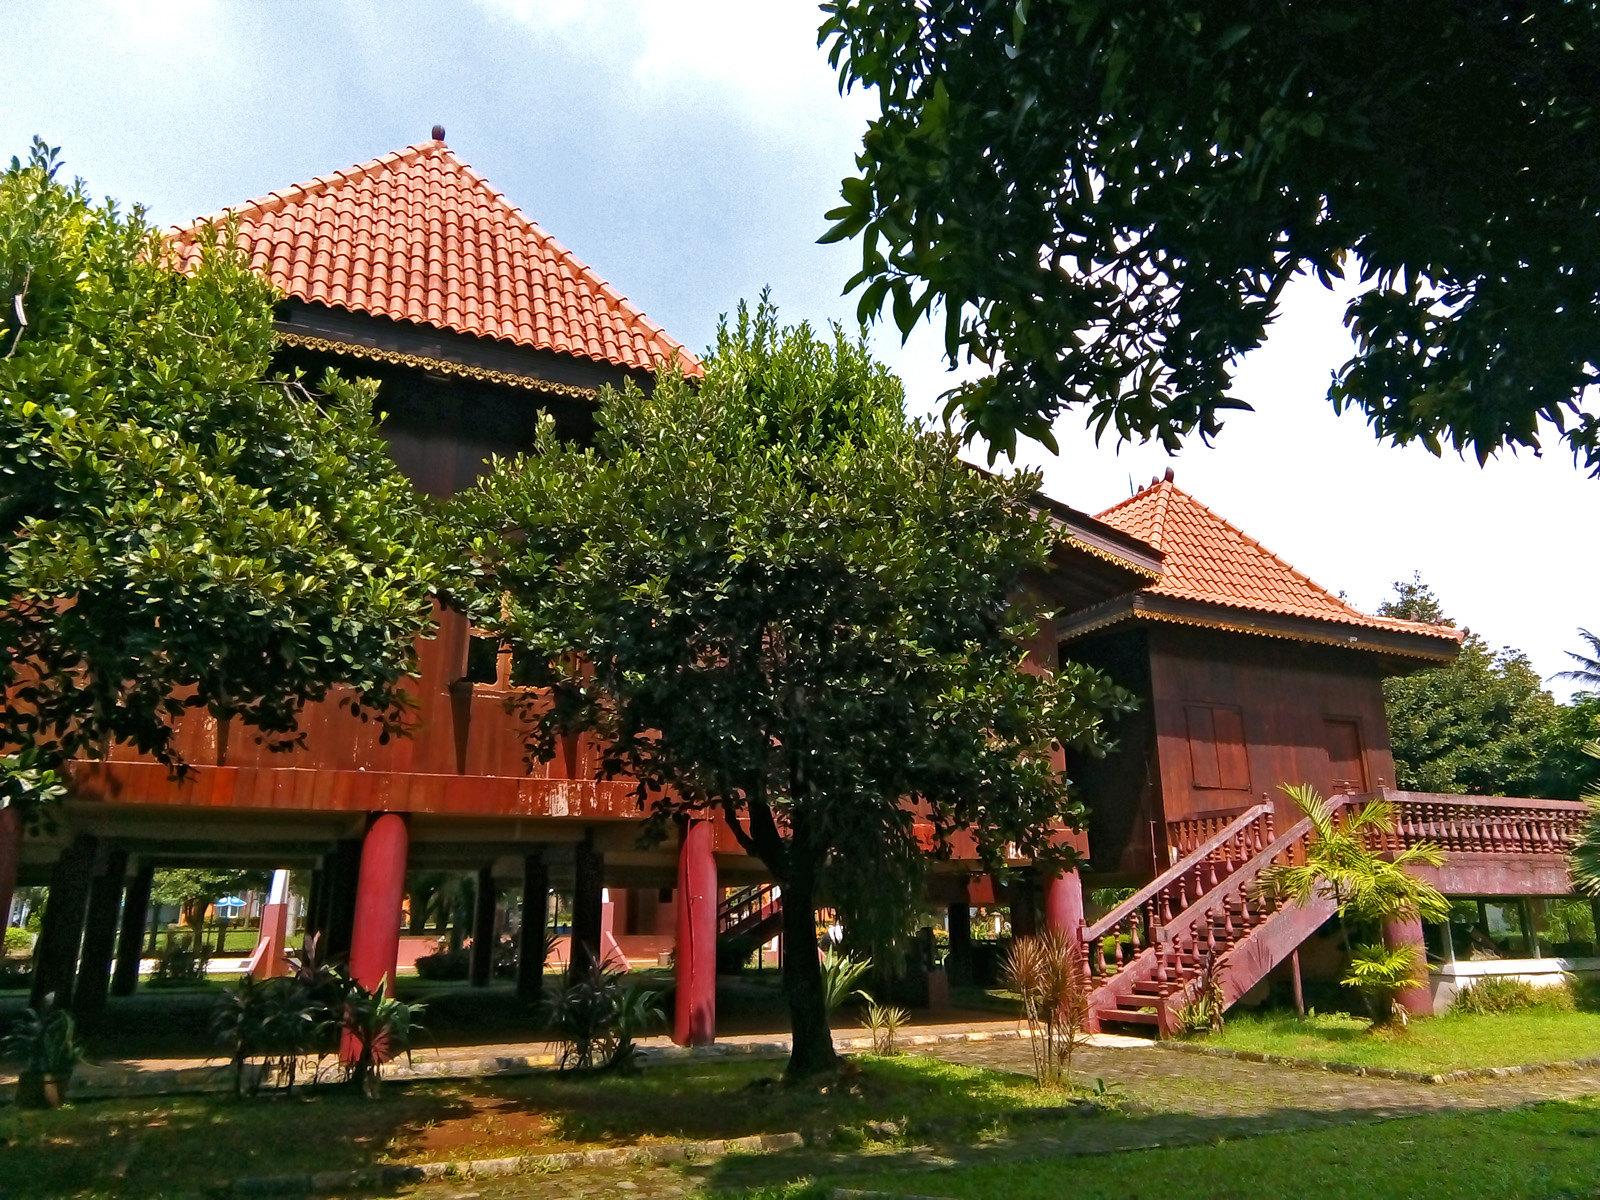 10 Fakta Tentang Rumah Limas Asal Sumatera Selatan